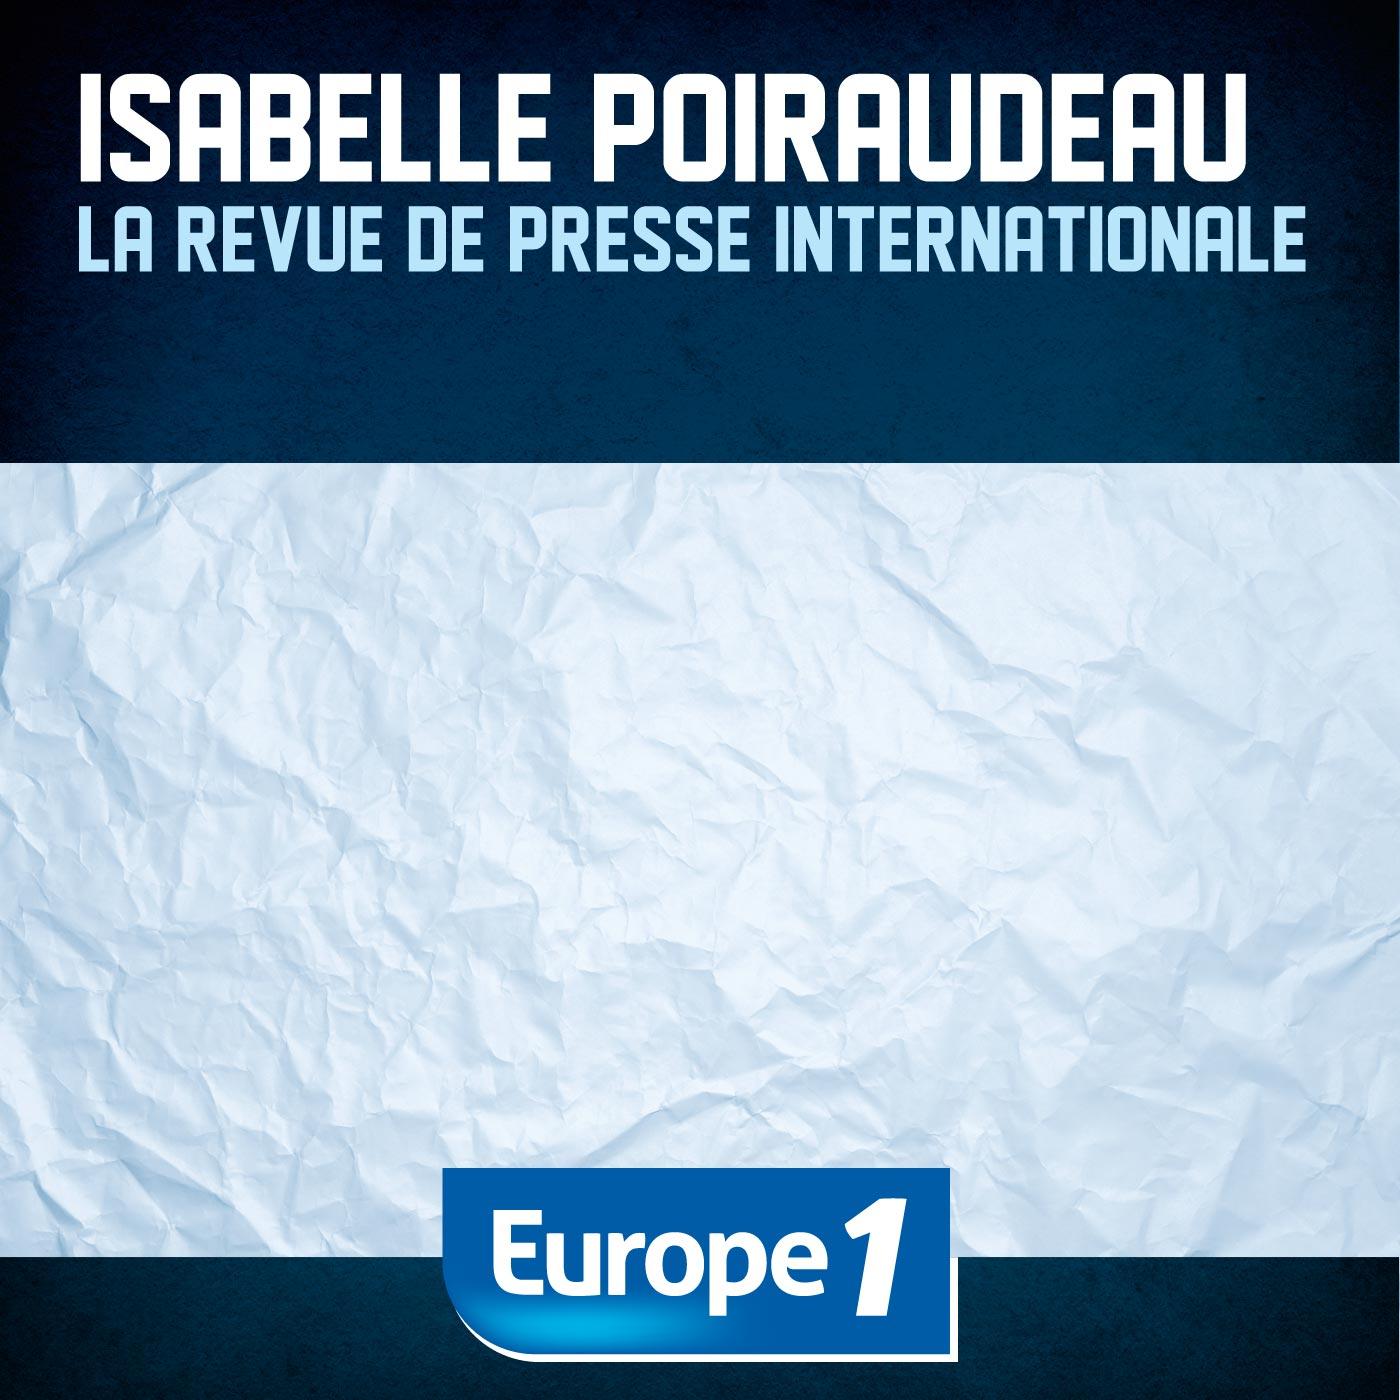 Image 1: Europe 1 Revue de presse etranger